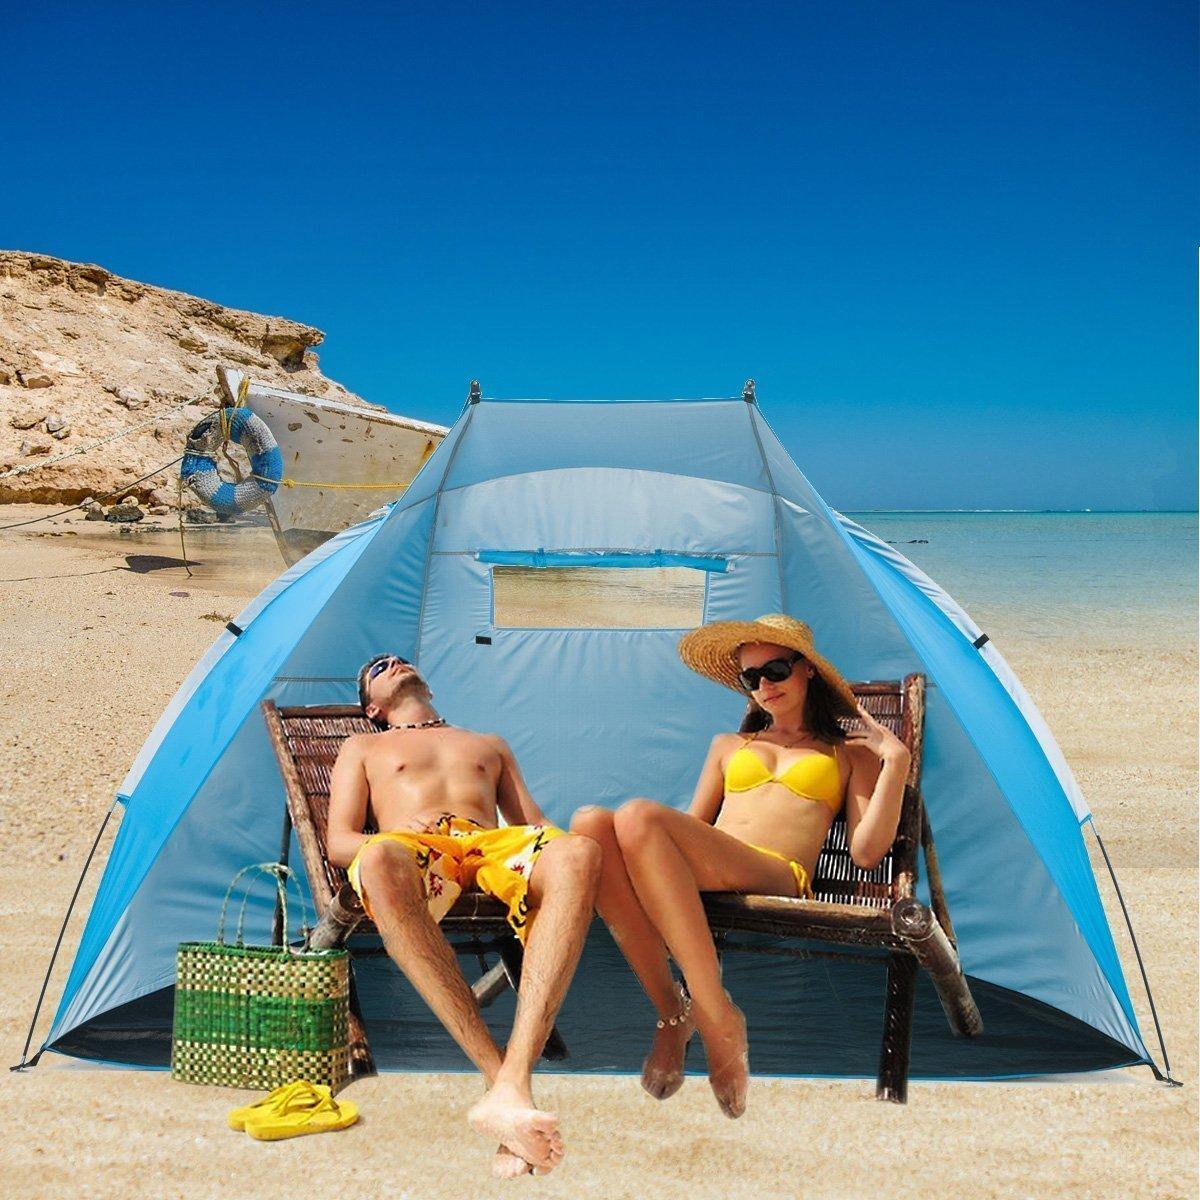 Extra Large Beach Cabana Tent Sun Shelter Sunshade Outdoor Portable UPF 50+, 94.5'' L x 47.2'' W x 55'' H,Light Blue (Light Blue) by Suhleir